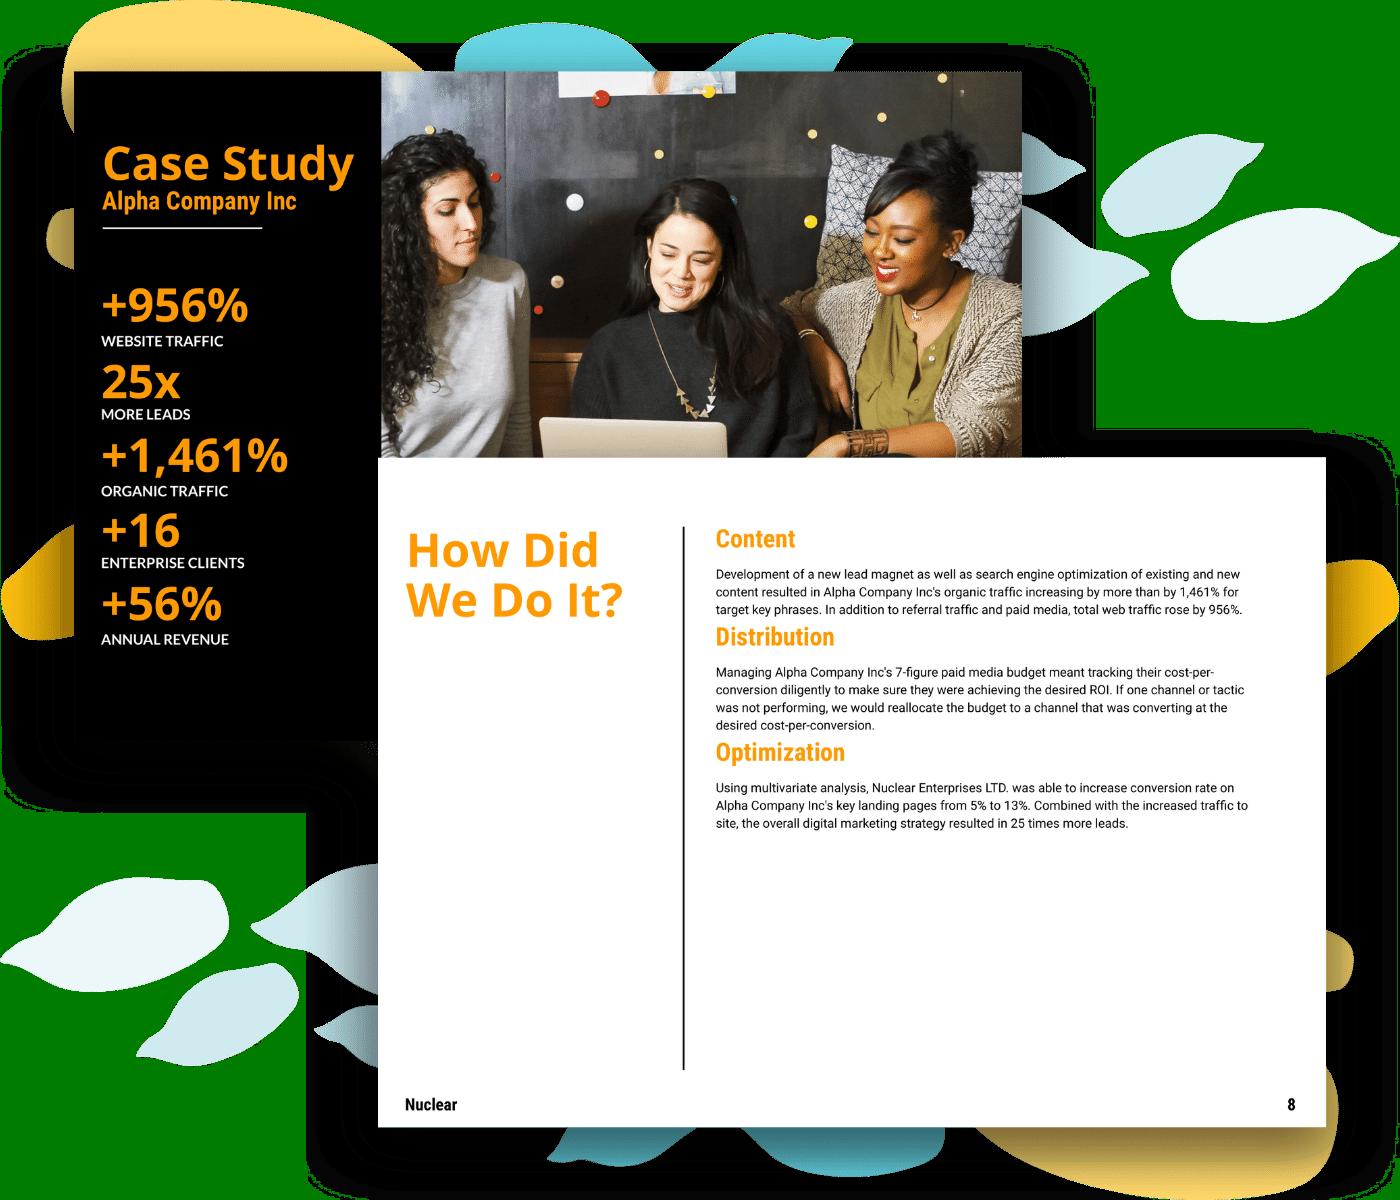 Digital marketing proposal template case study